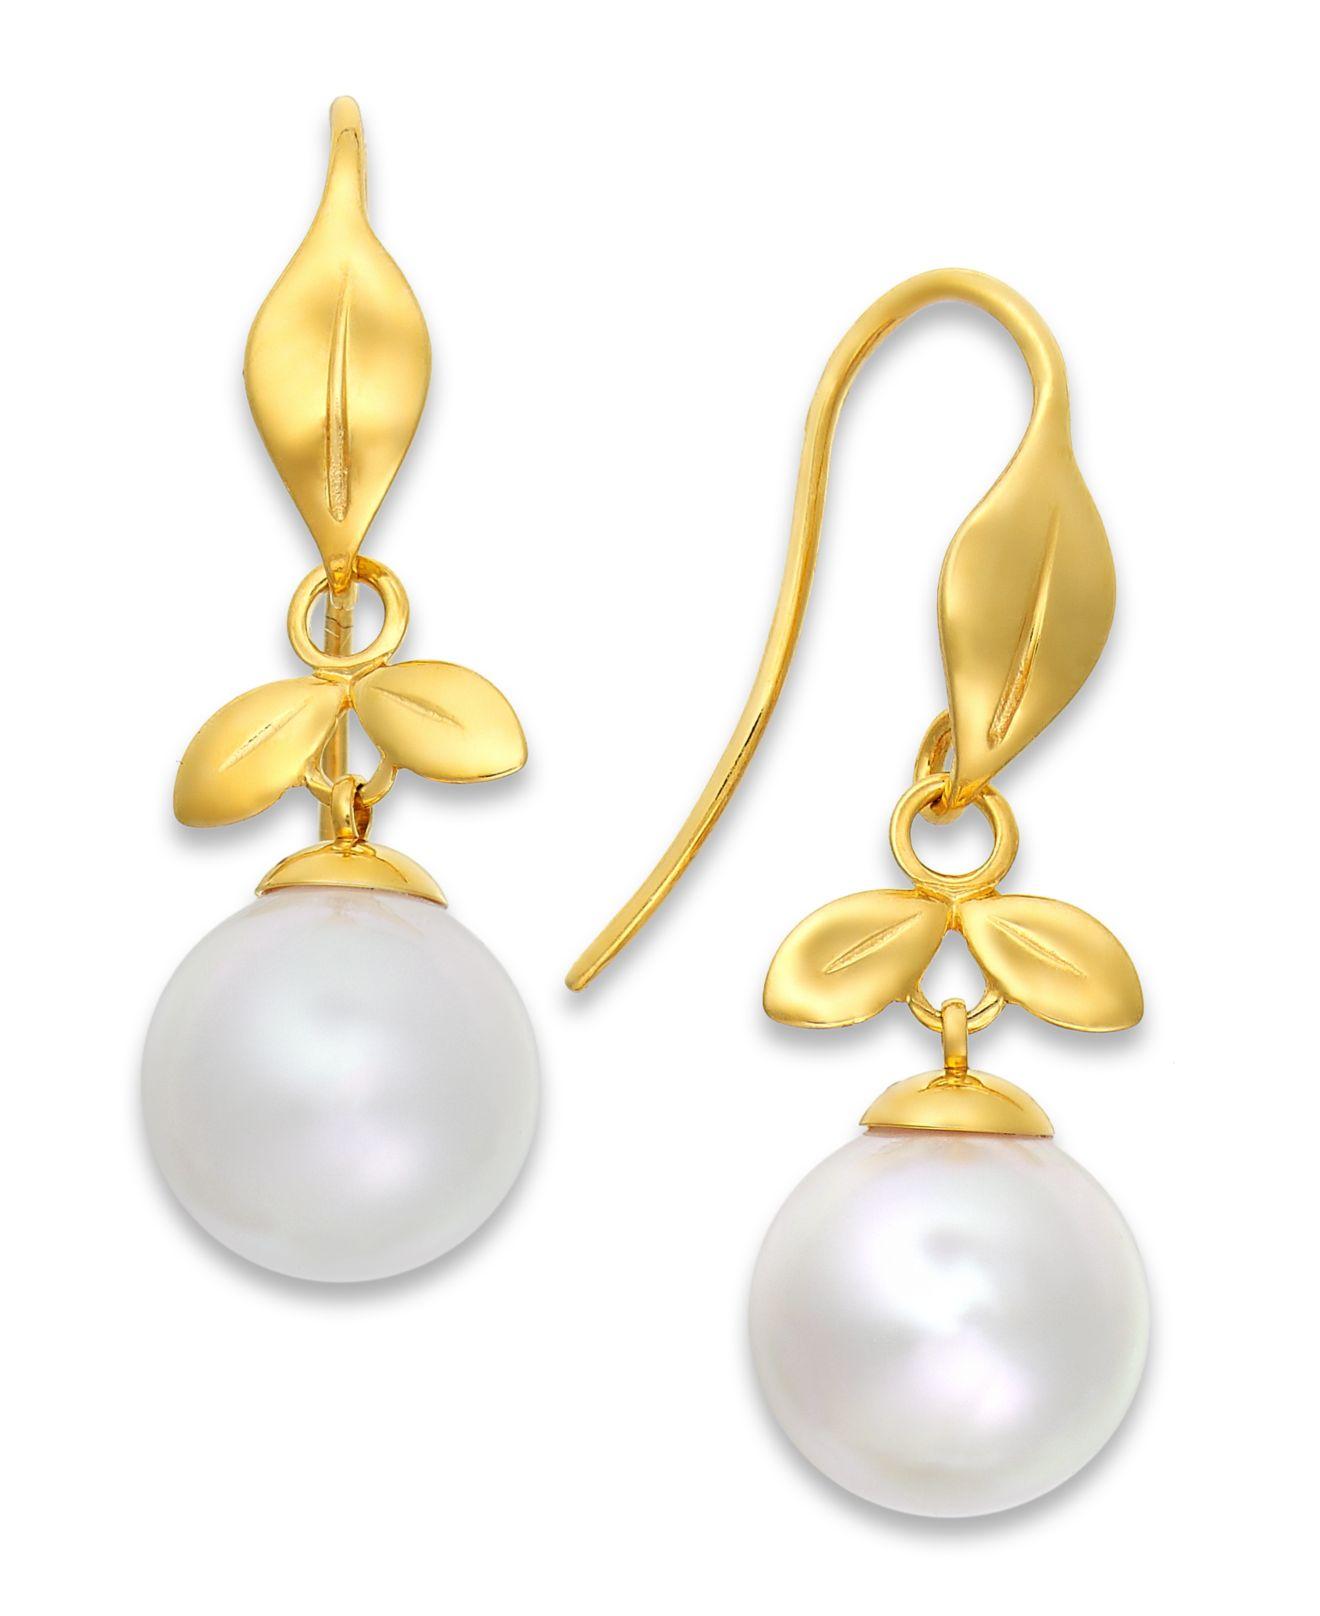 Majorica 18k Vermeil Pave Crystal Pearly Bar Drop Earrings jKCXL424Z